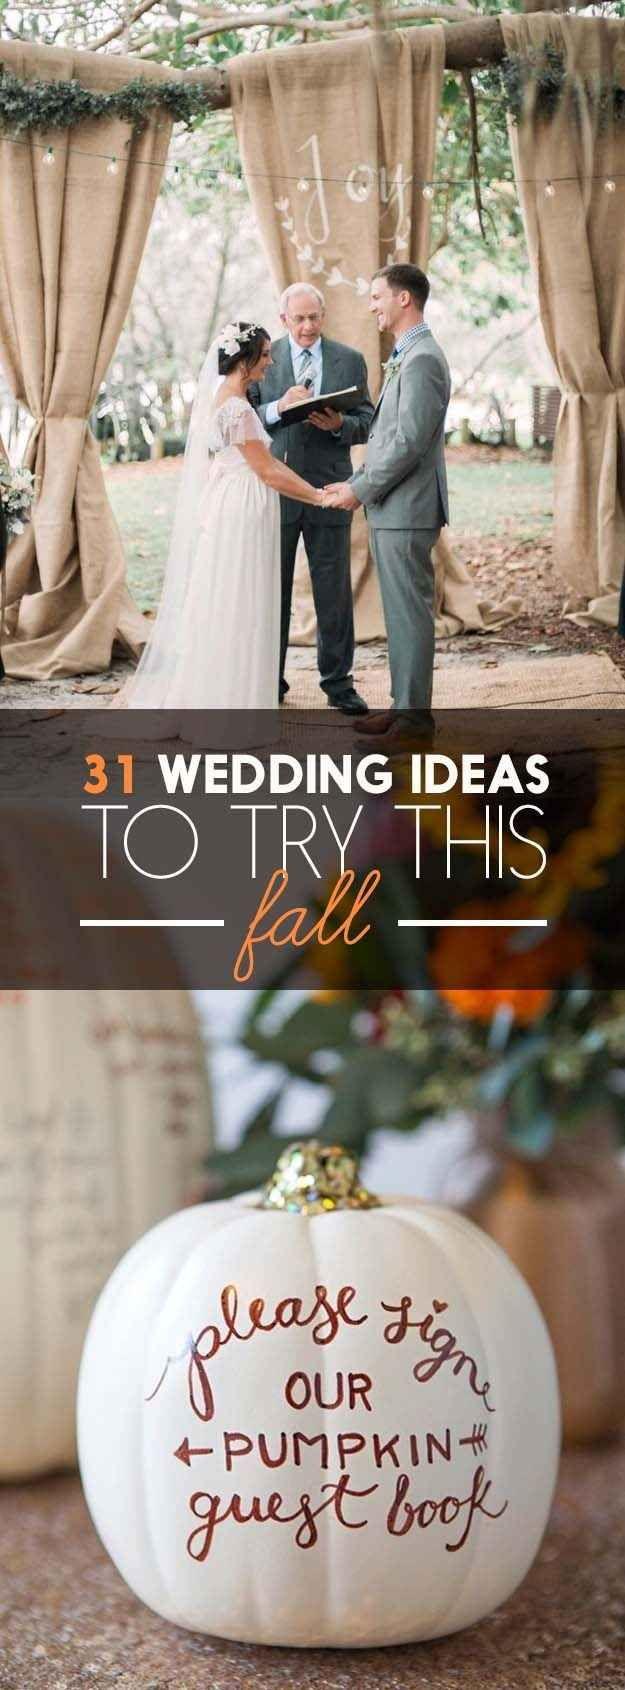 La Masía Les Casotes | Bodas de Otoño #boda #bodas #wedding #inspiracion